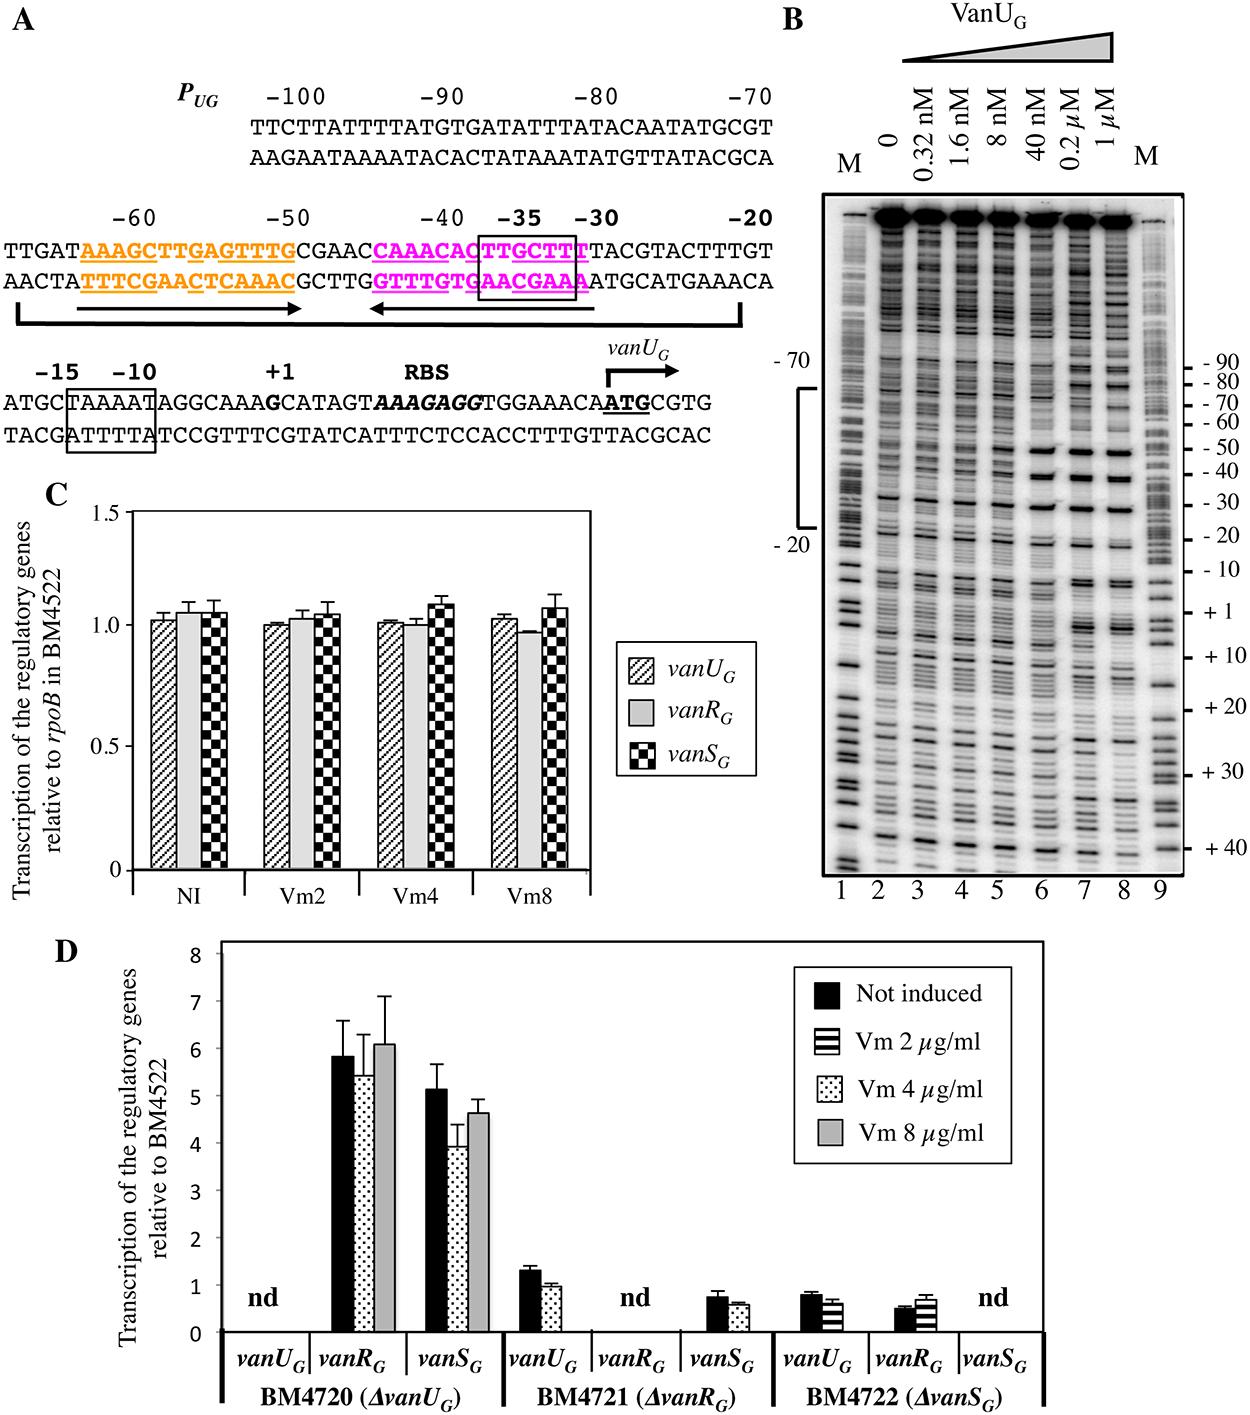 Binding sites of VanU<sub>G</sub> to the <i>P</i><sub><i>UG</i></sub> regulatory promoter (A, B) and regulatory genes transcription (C, D).